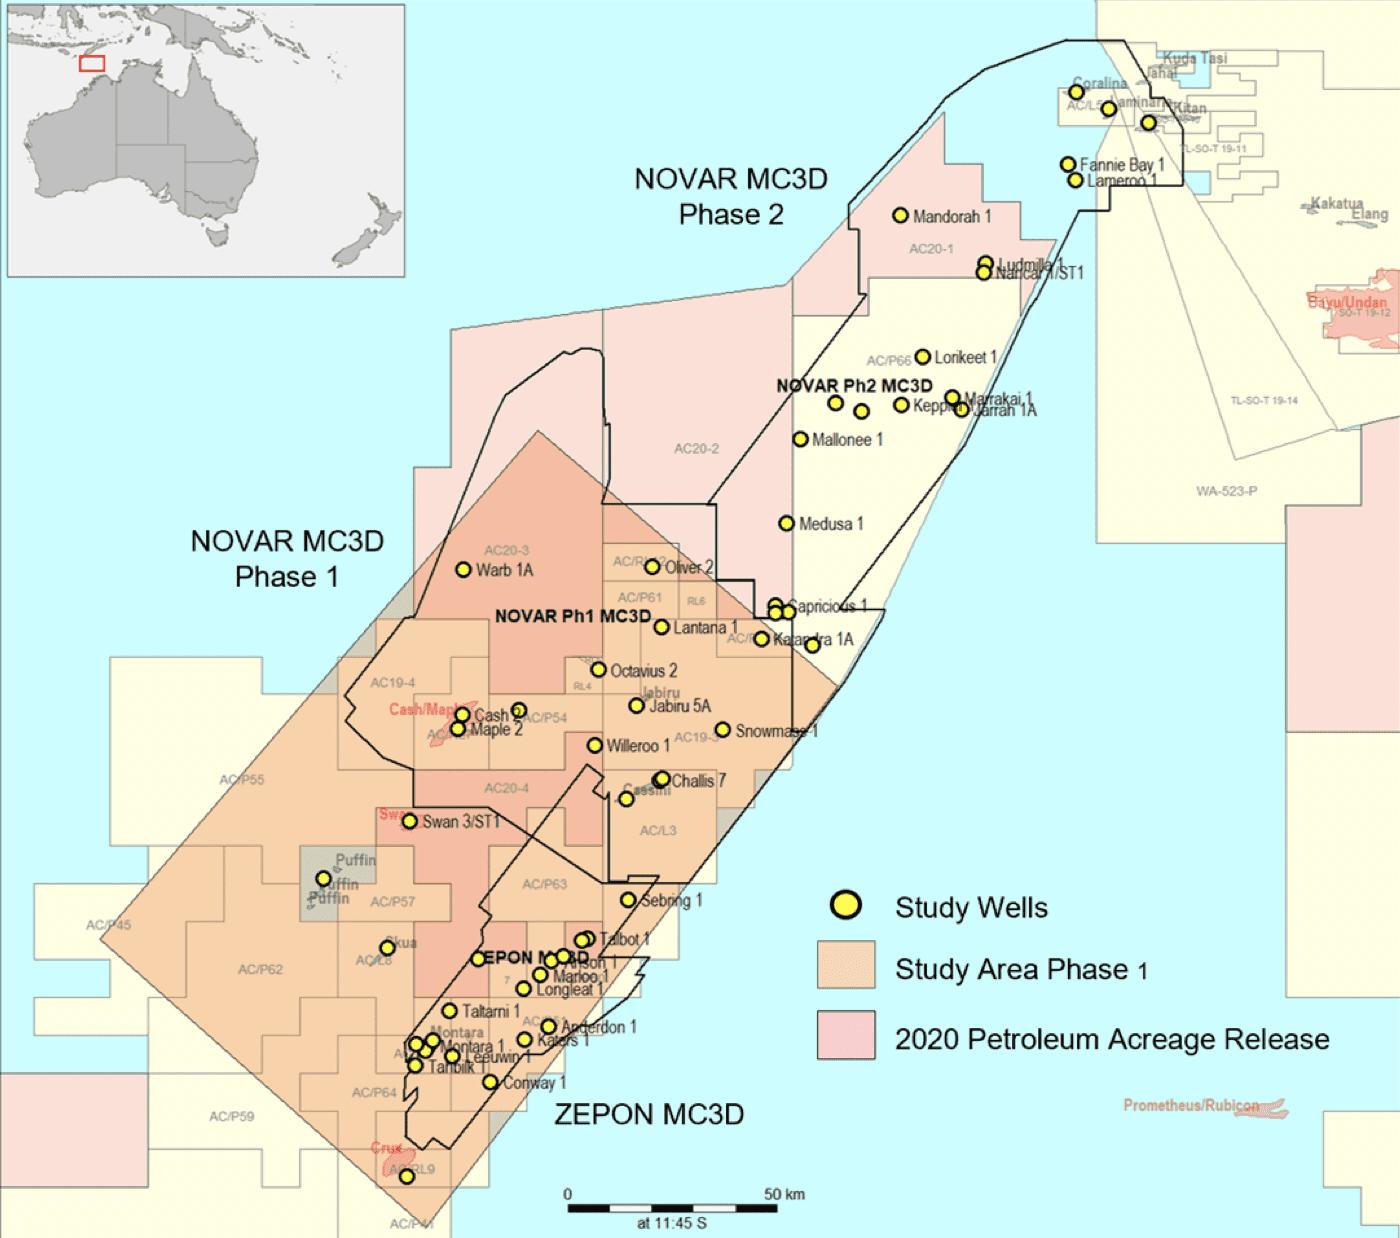 DUG Petrophysics & Rock Physics Study Vulcan Sub-Basin Phase 1